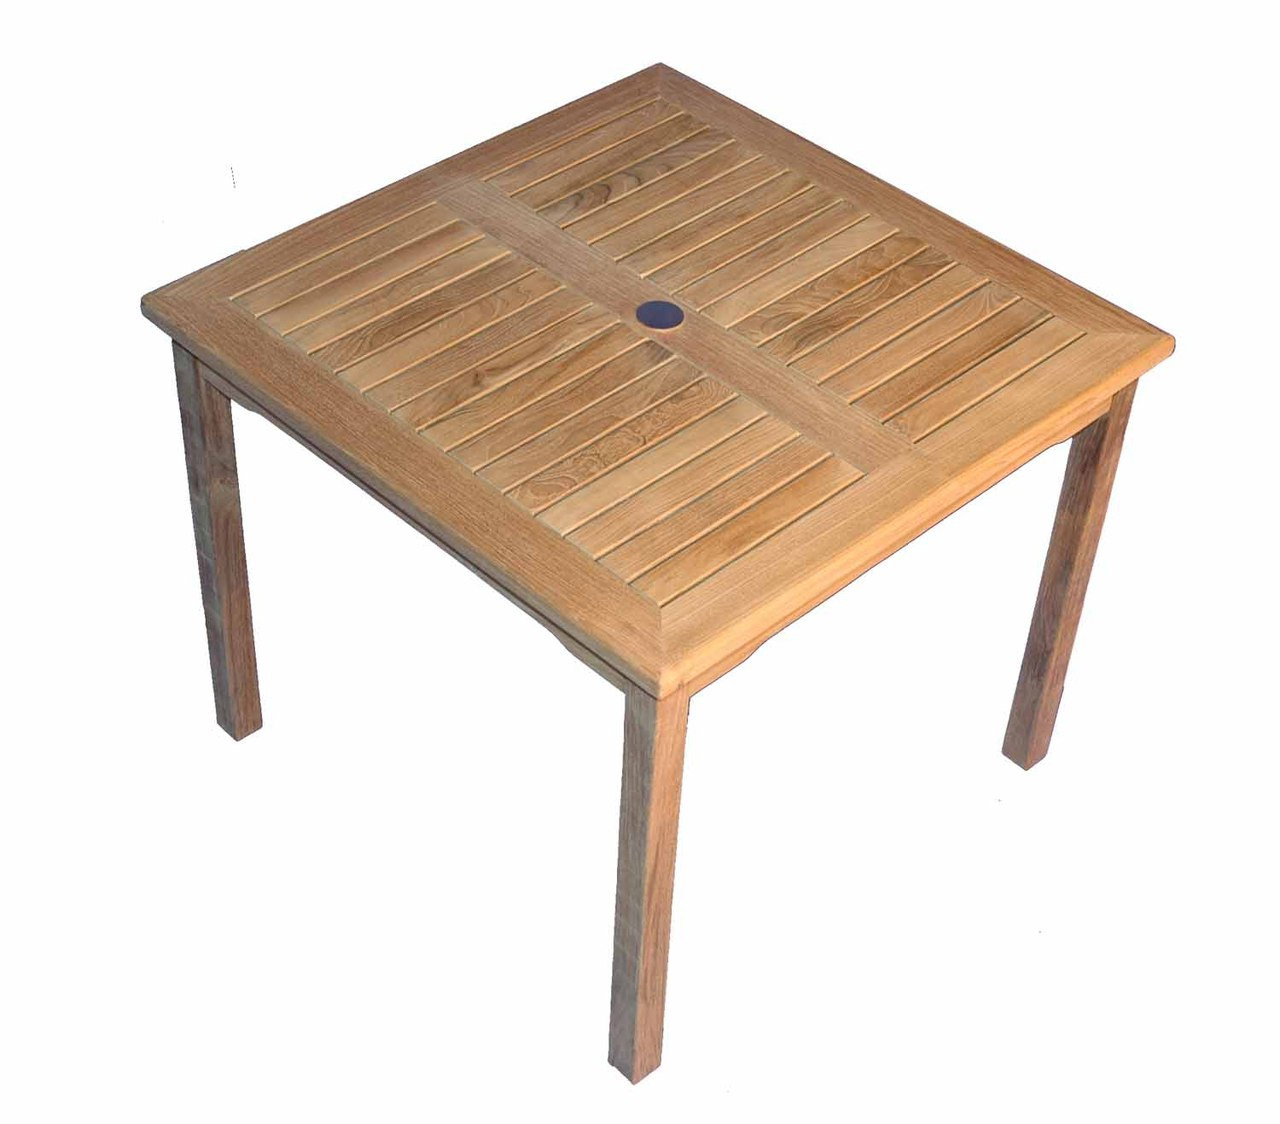 Solid-Teak-36in-Square-Bistro-Table-by-Regal-Teak